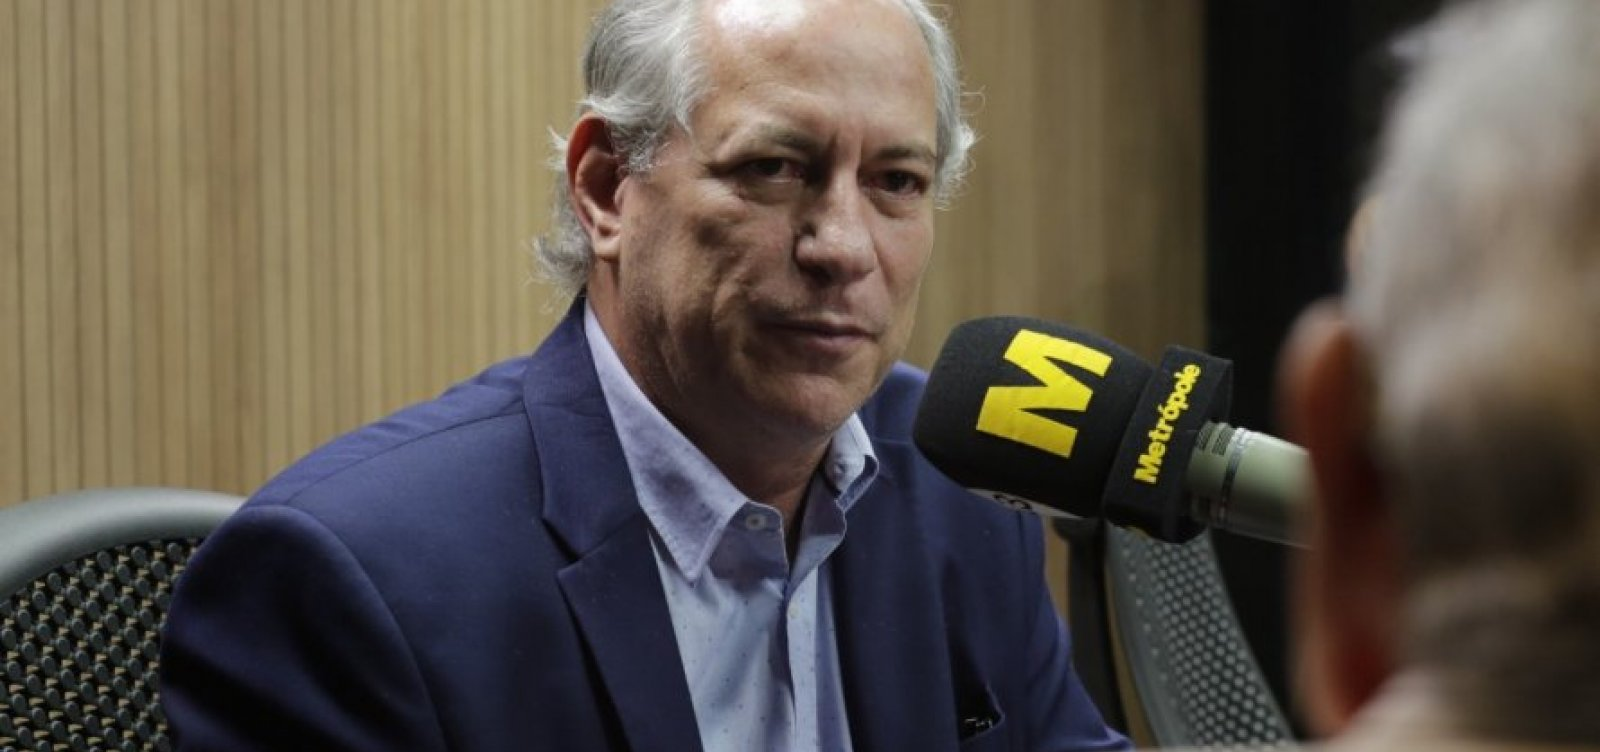 ['Na defesa da democracia, vamos tocar fogo na rua', diz Ciro sobre tuíte de Carlos]